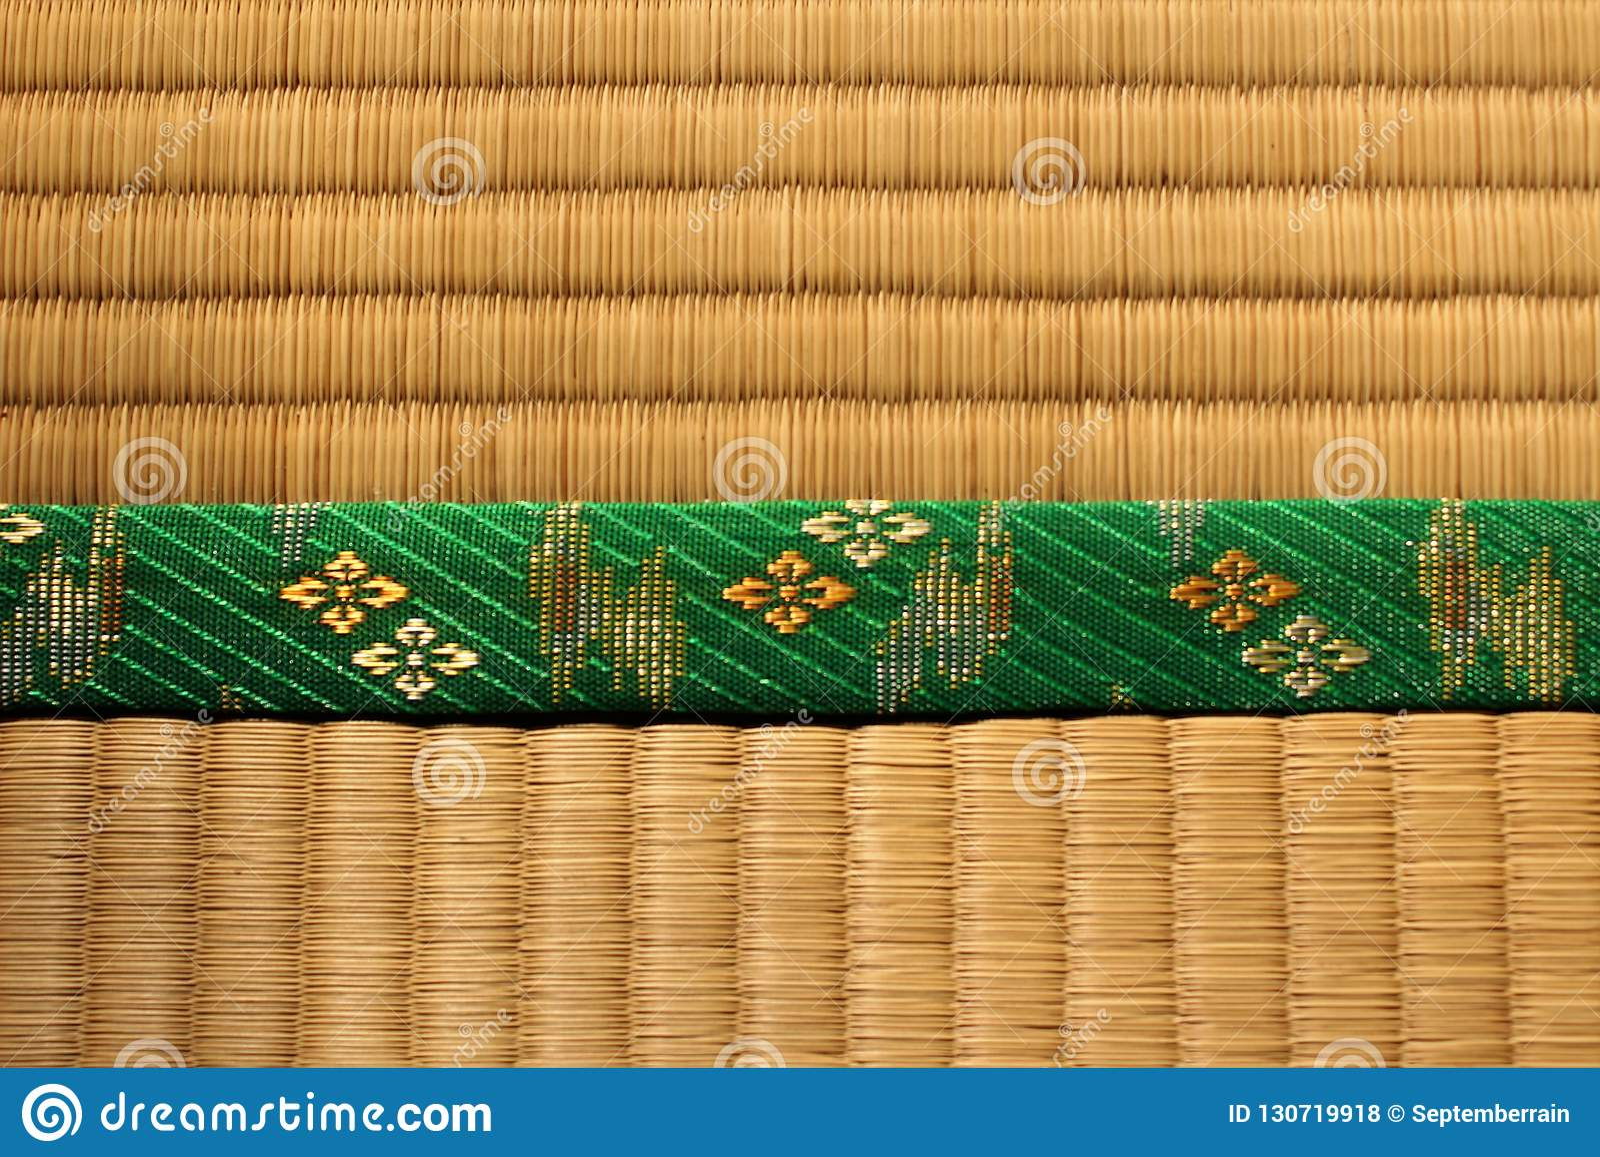 Борцовские маты , татами , даянг , ковёр - пазл , мягкий пол ... | 1155x1600